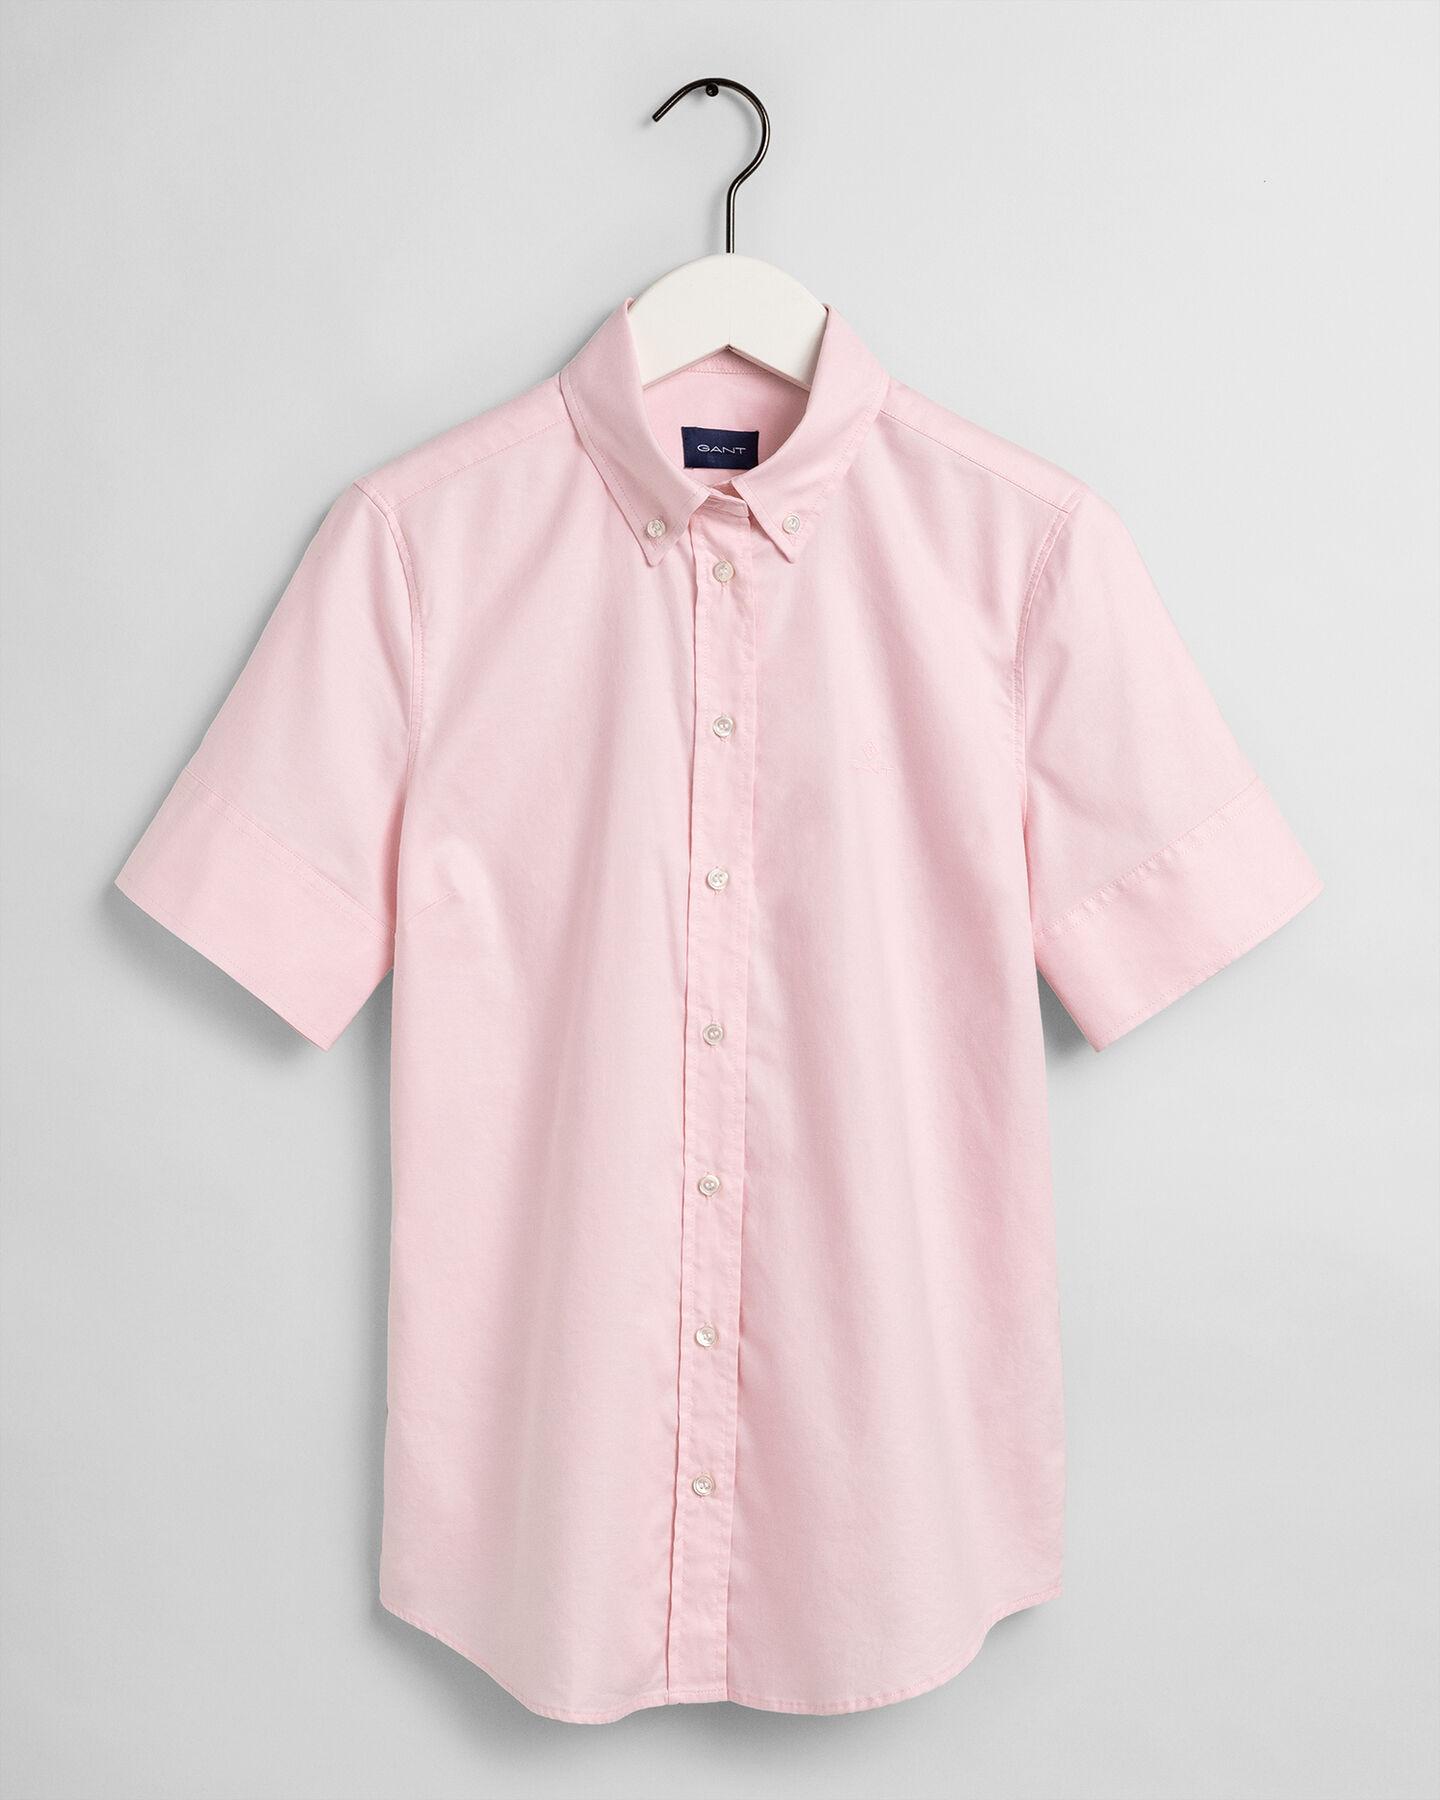 Short Sleeve Stretch Oxford Shirt